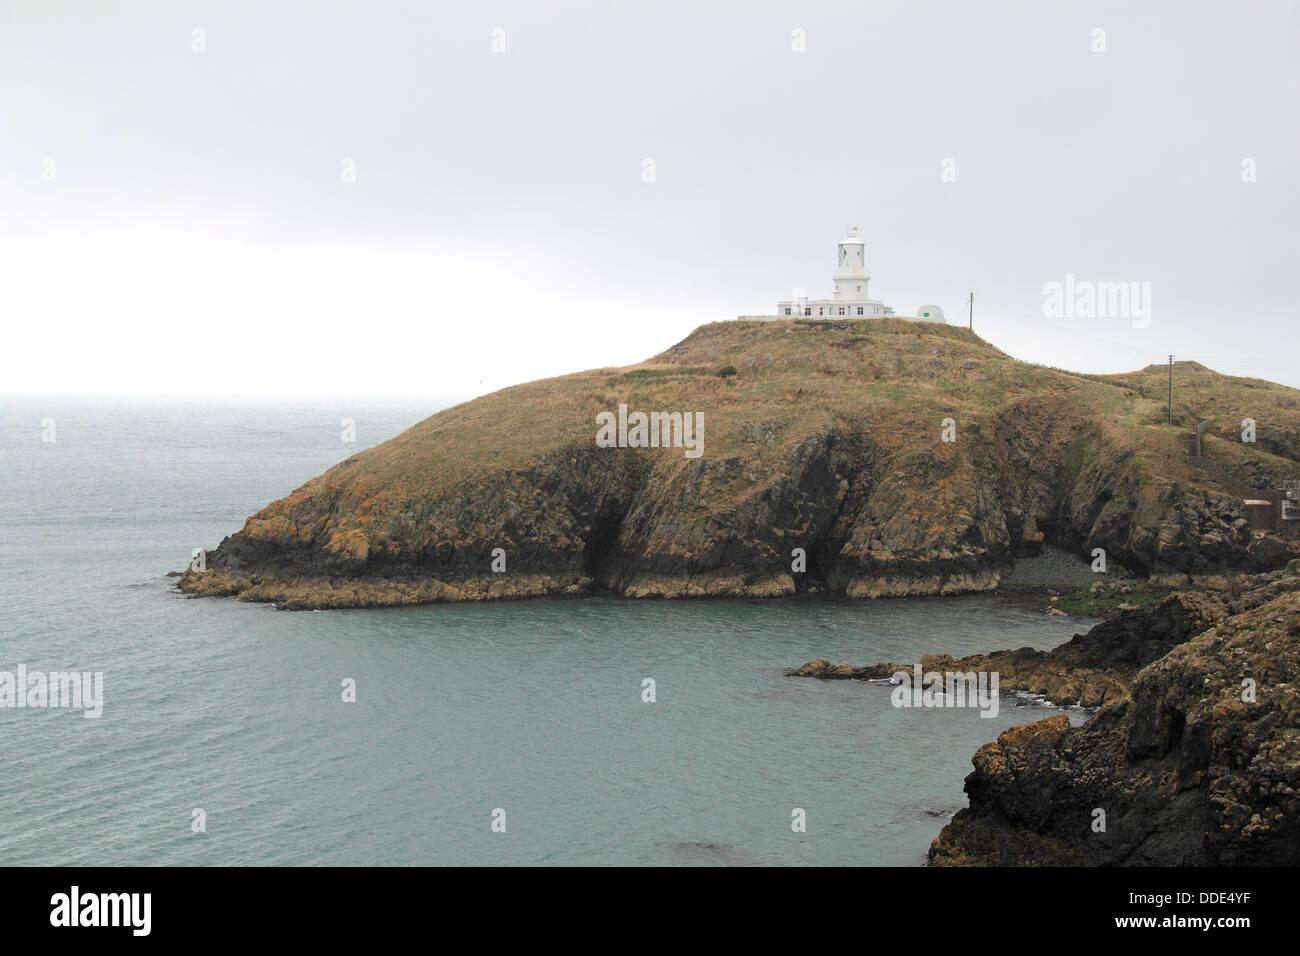 Strumble Head Lighthouse, Pen Caer, Pembrokeshire, Wales, Great Britain, United Kingdom, UK, Europe - Stock Image